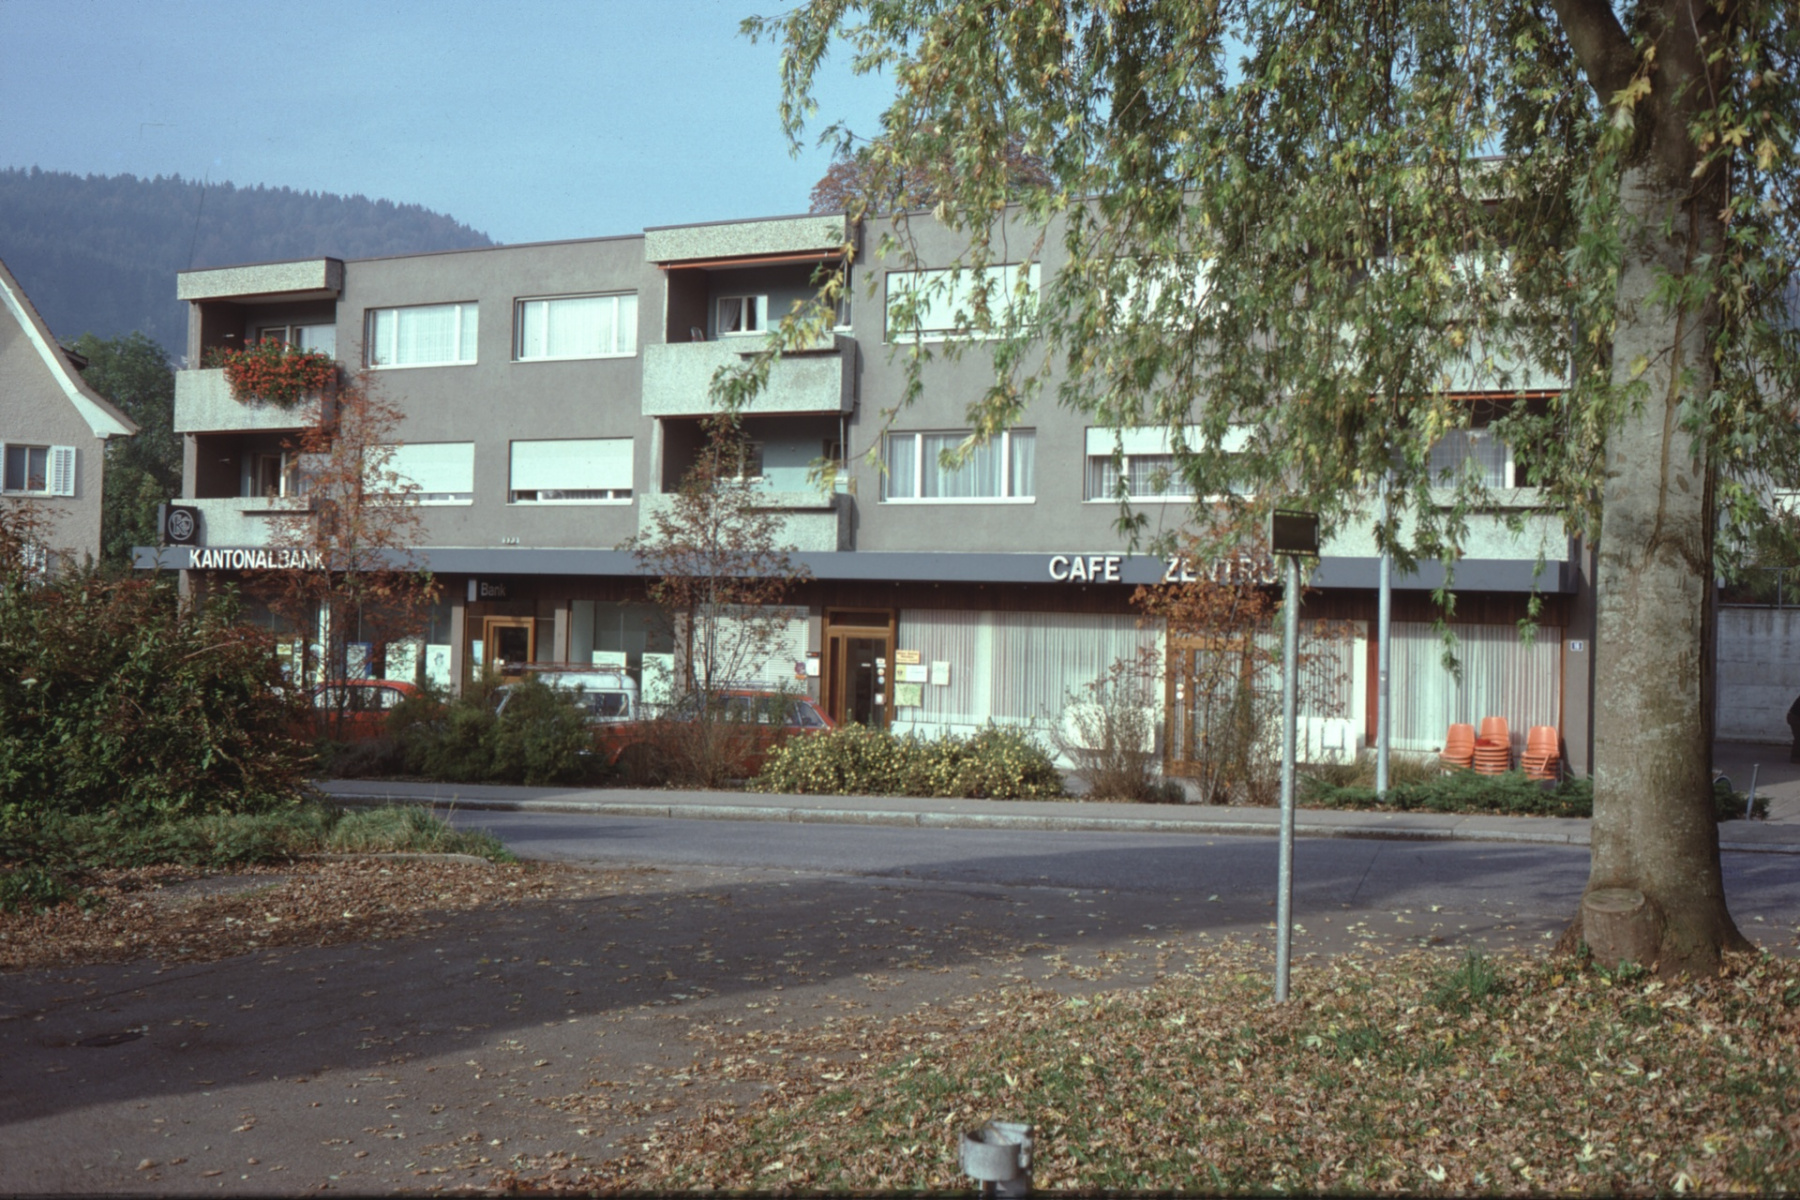 Kantonalbank ( Frontal, 1977)